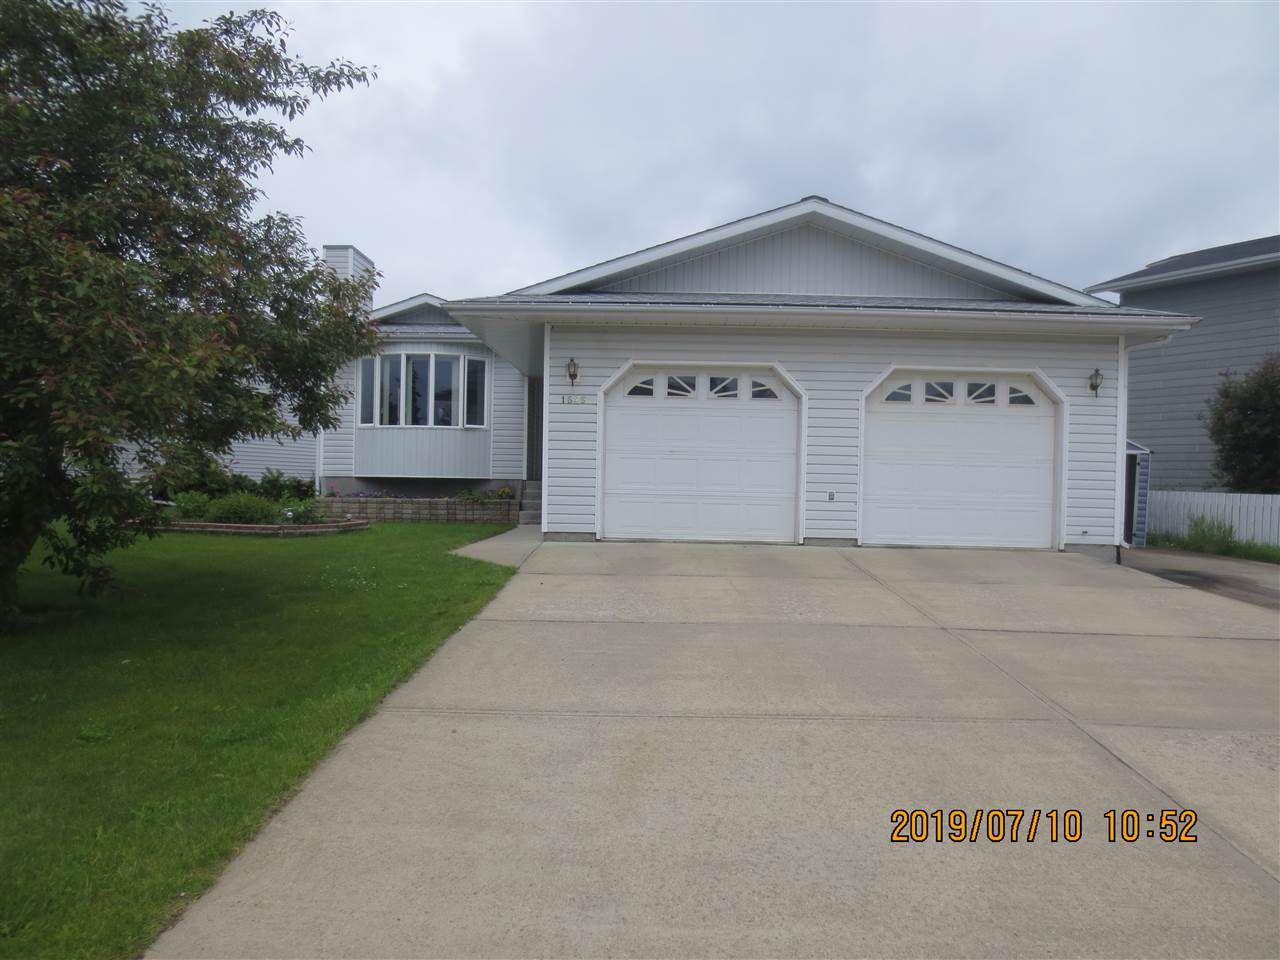 Main Photo: 1646 52 Street: Edson House for sale : MLS®# E4165287